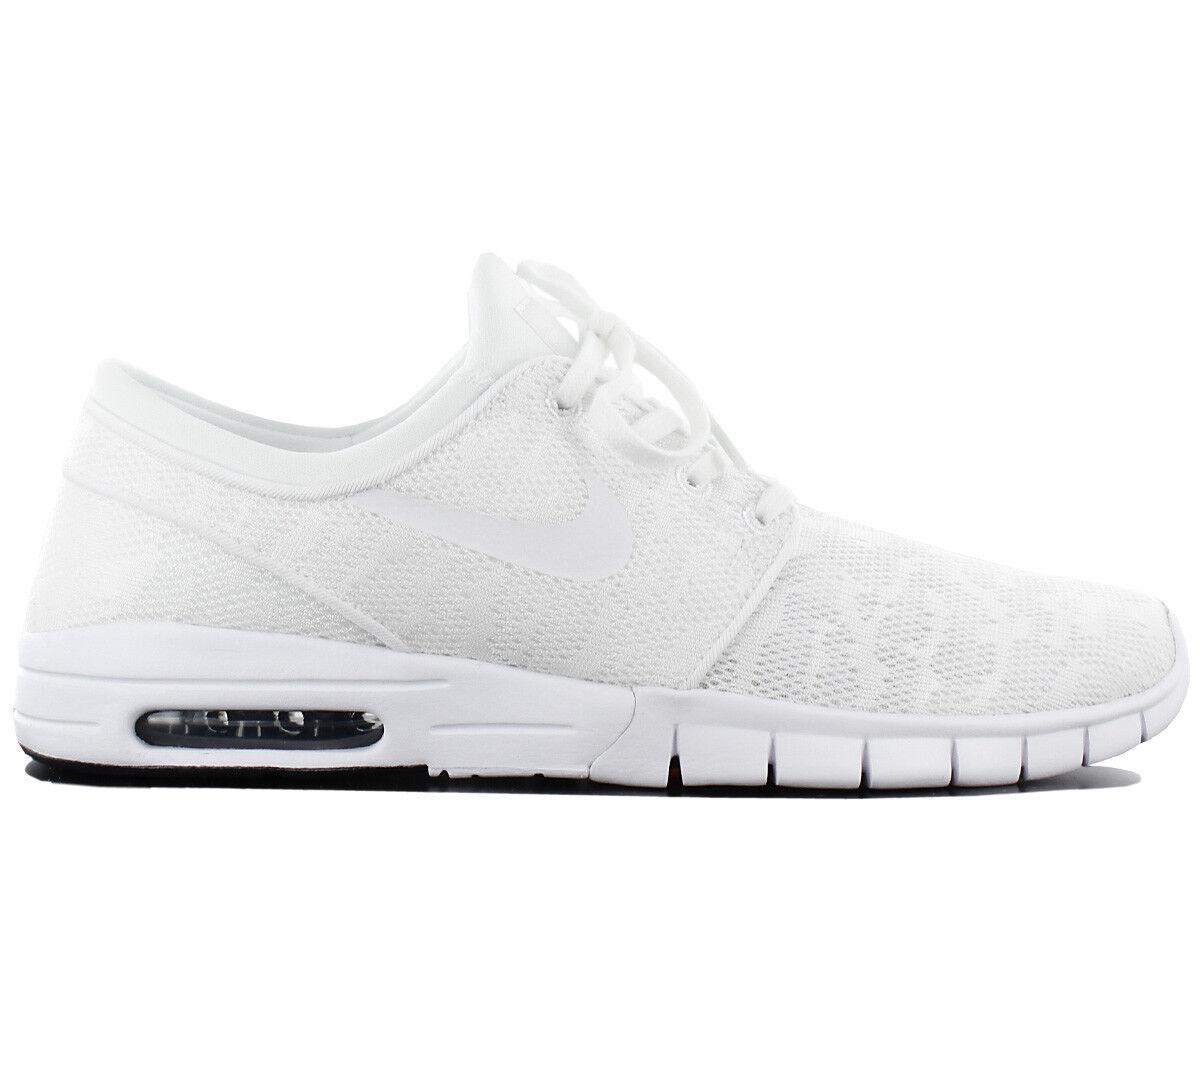 Nike Sb Stefan Janoski Air Max Uomo  White  Shoes 631303 114